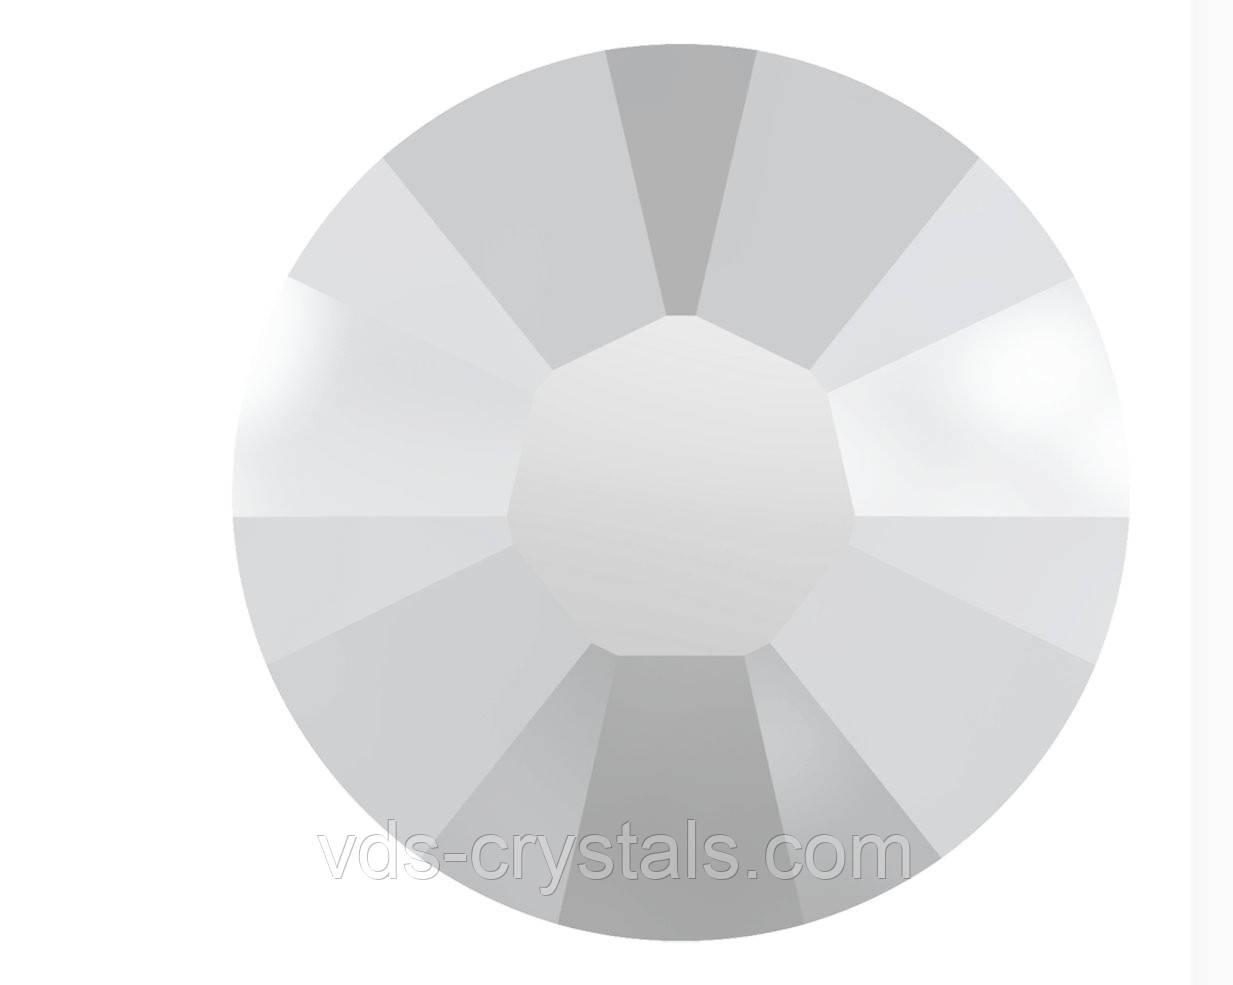 Камни Сваровски клеевые горячей фиксации 2038 Chalkwhite (упаковка 1440 шт.)